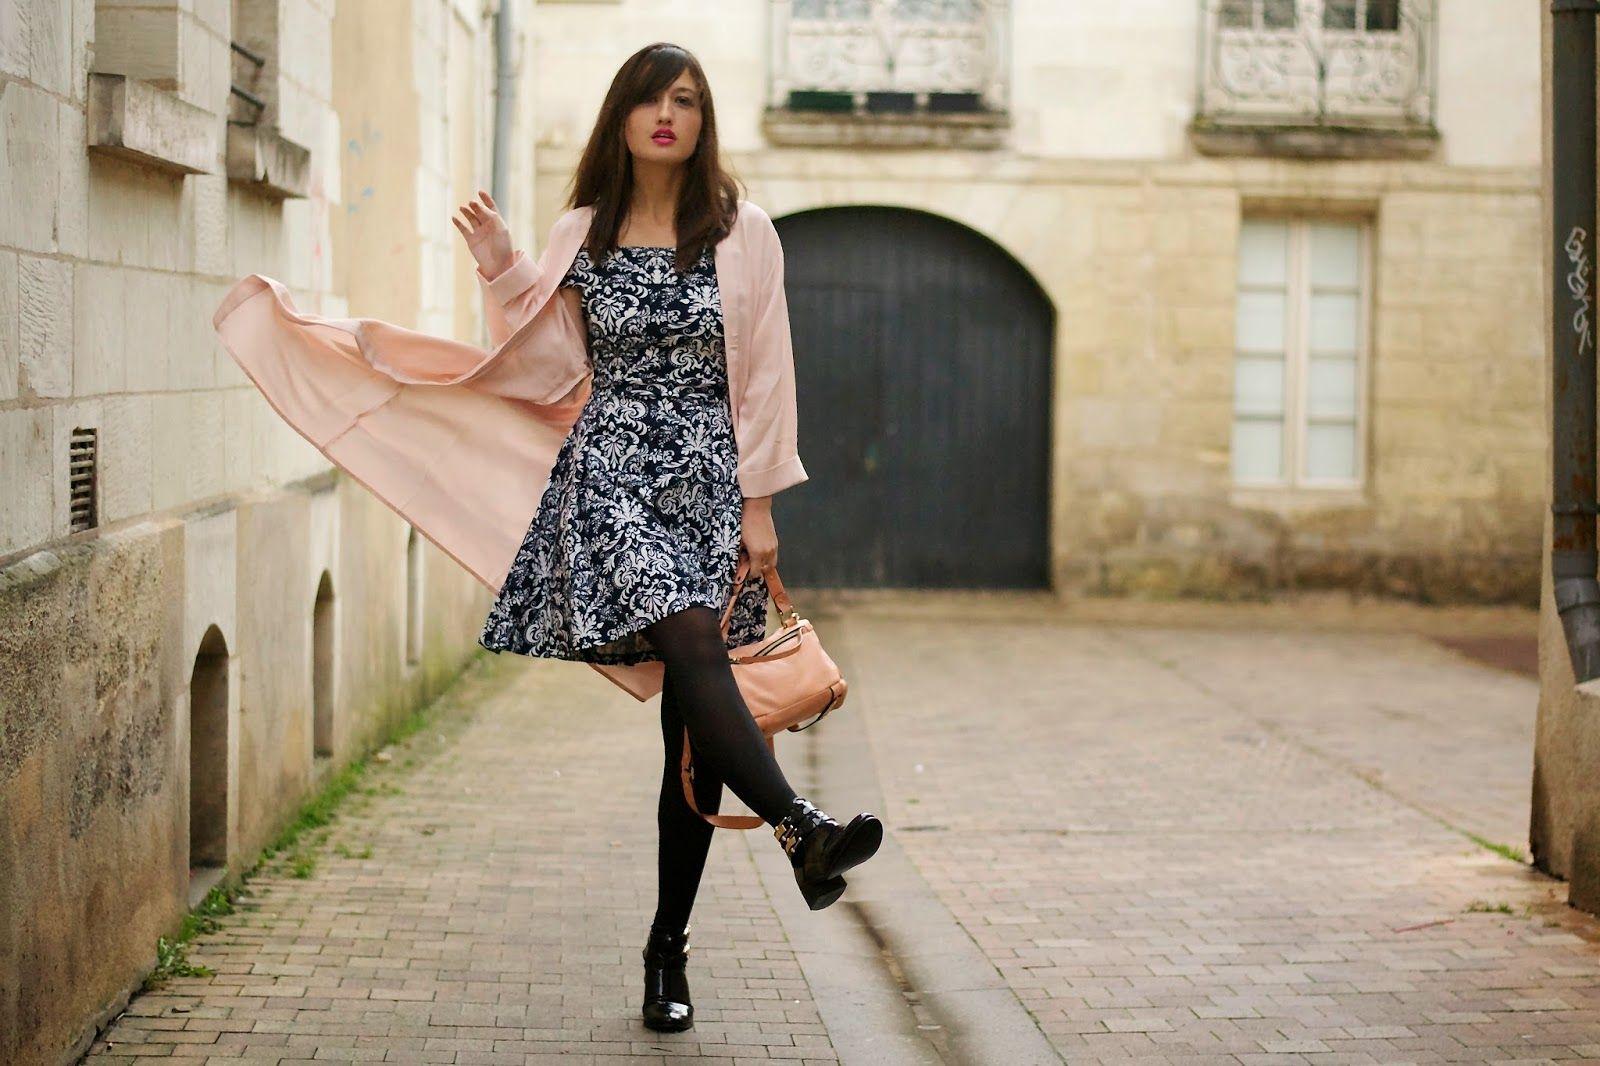 Fashion photography blogs